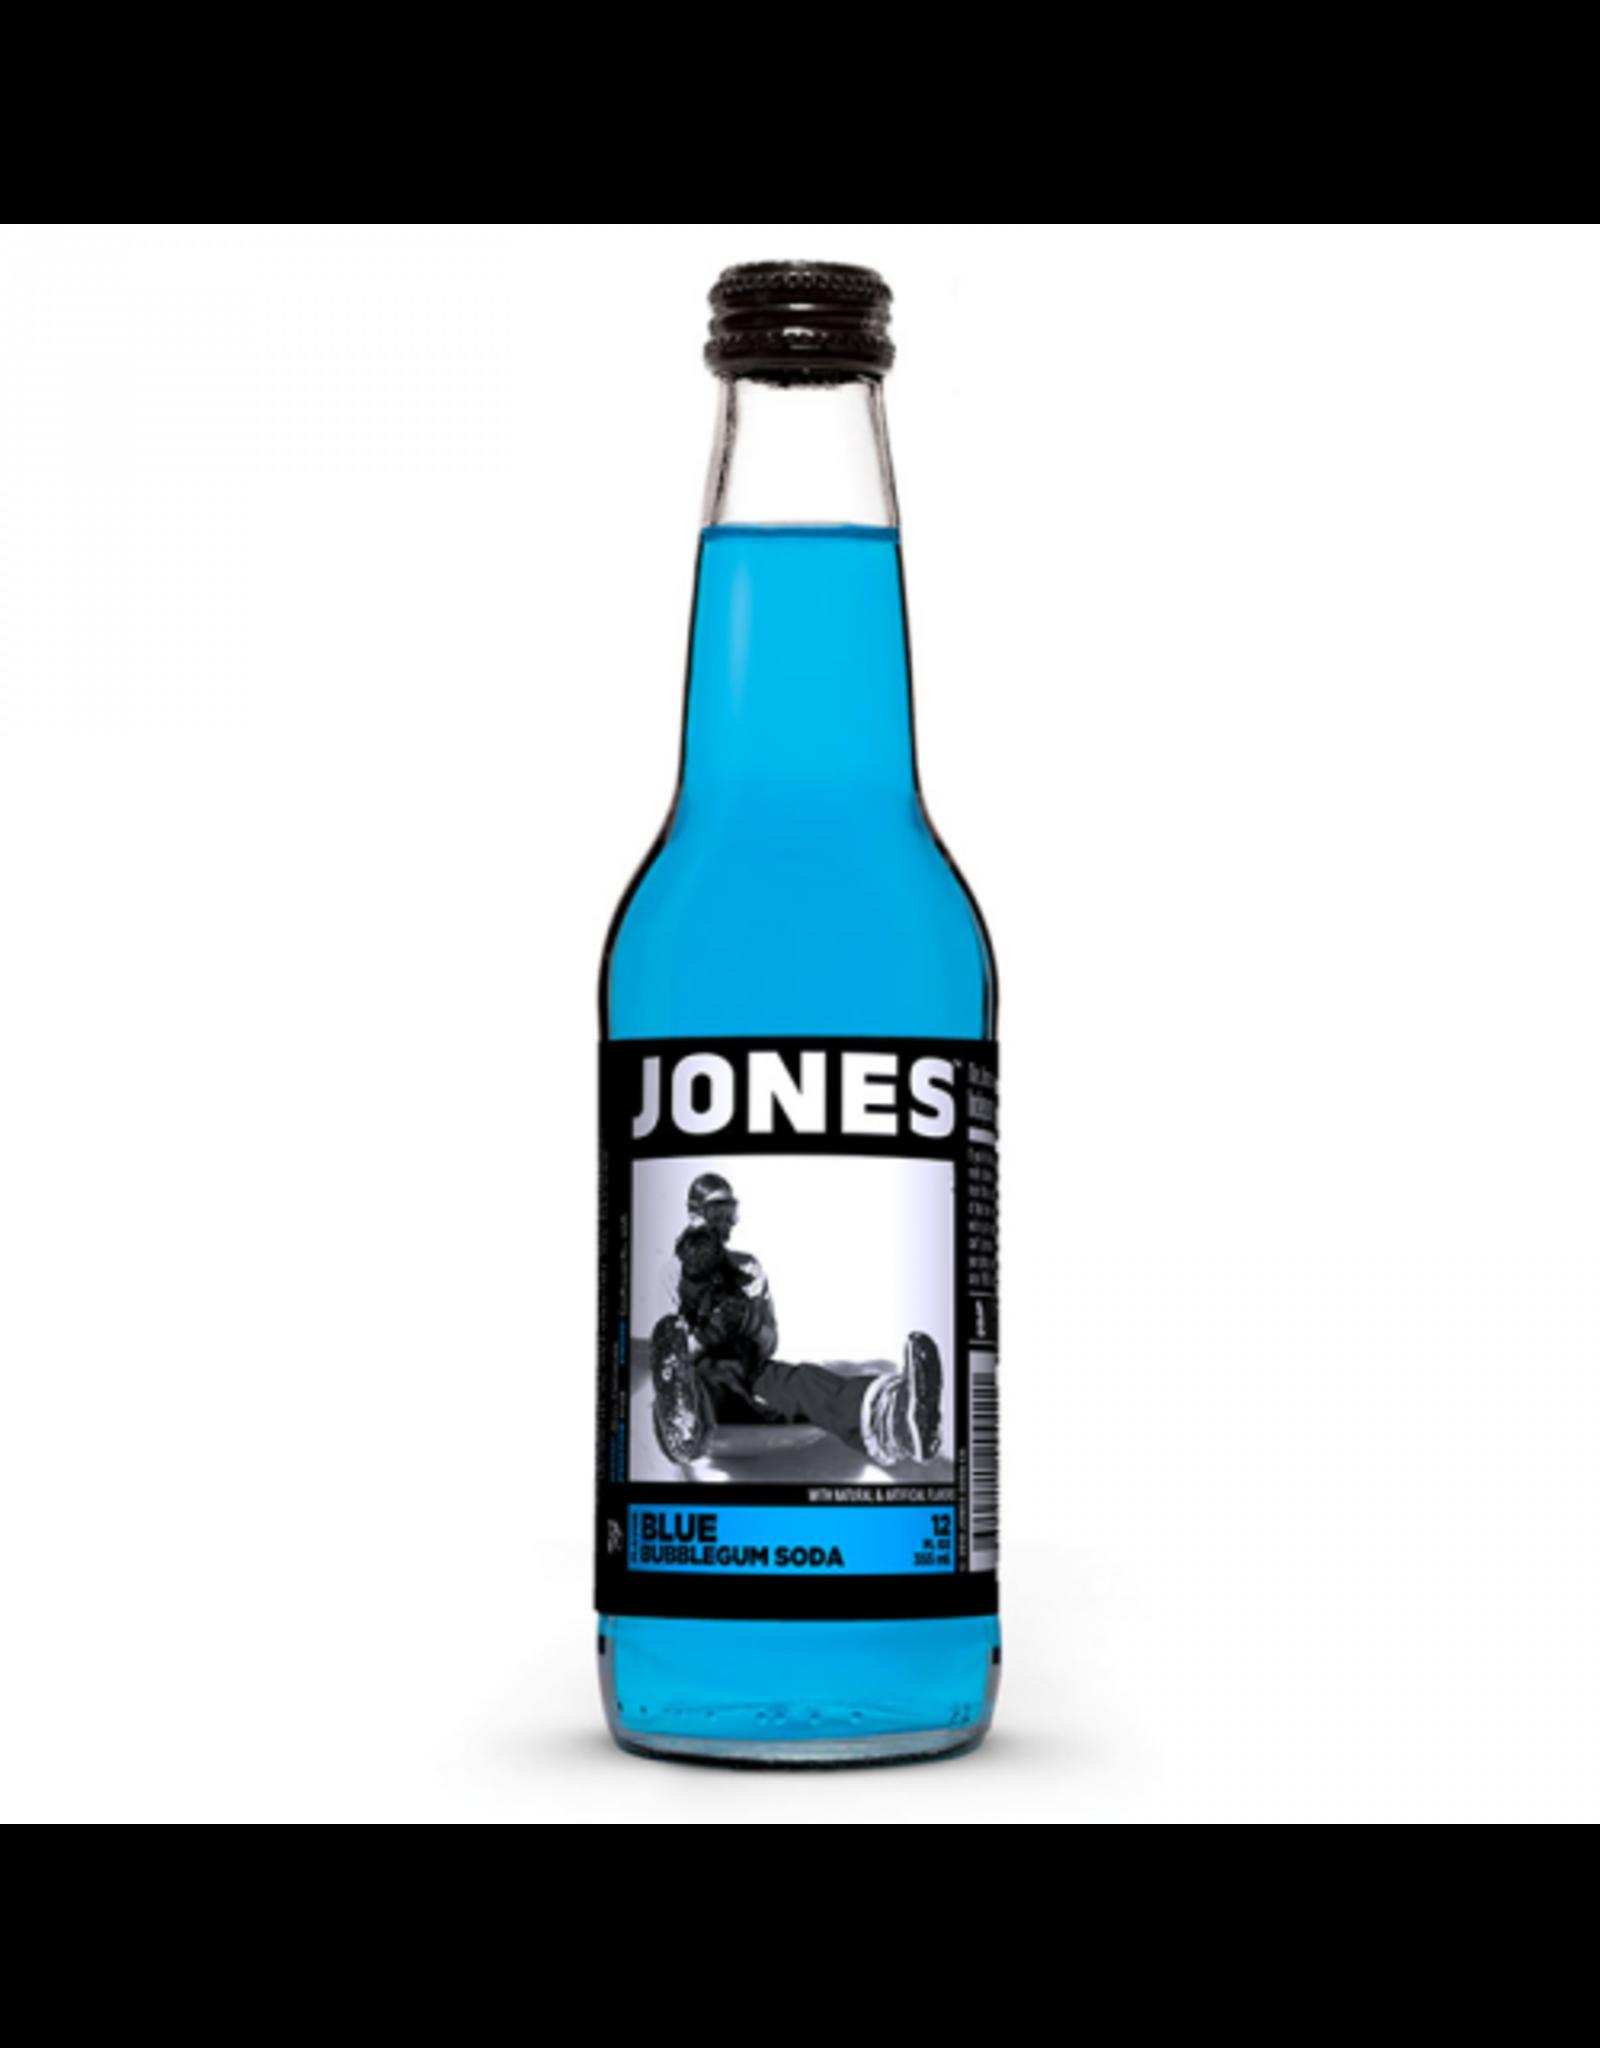 Jones - Blue Bubblegum Soda - Cane Sugar Soda - 355ml